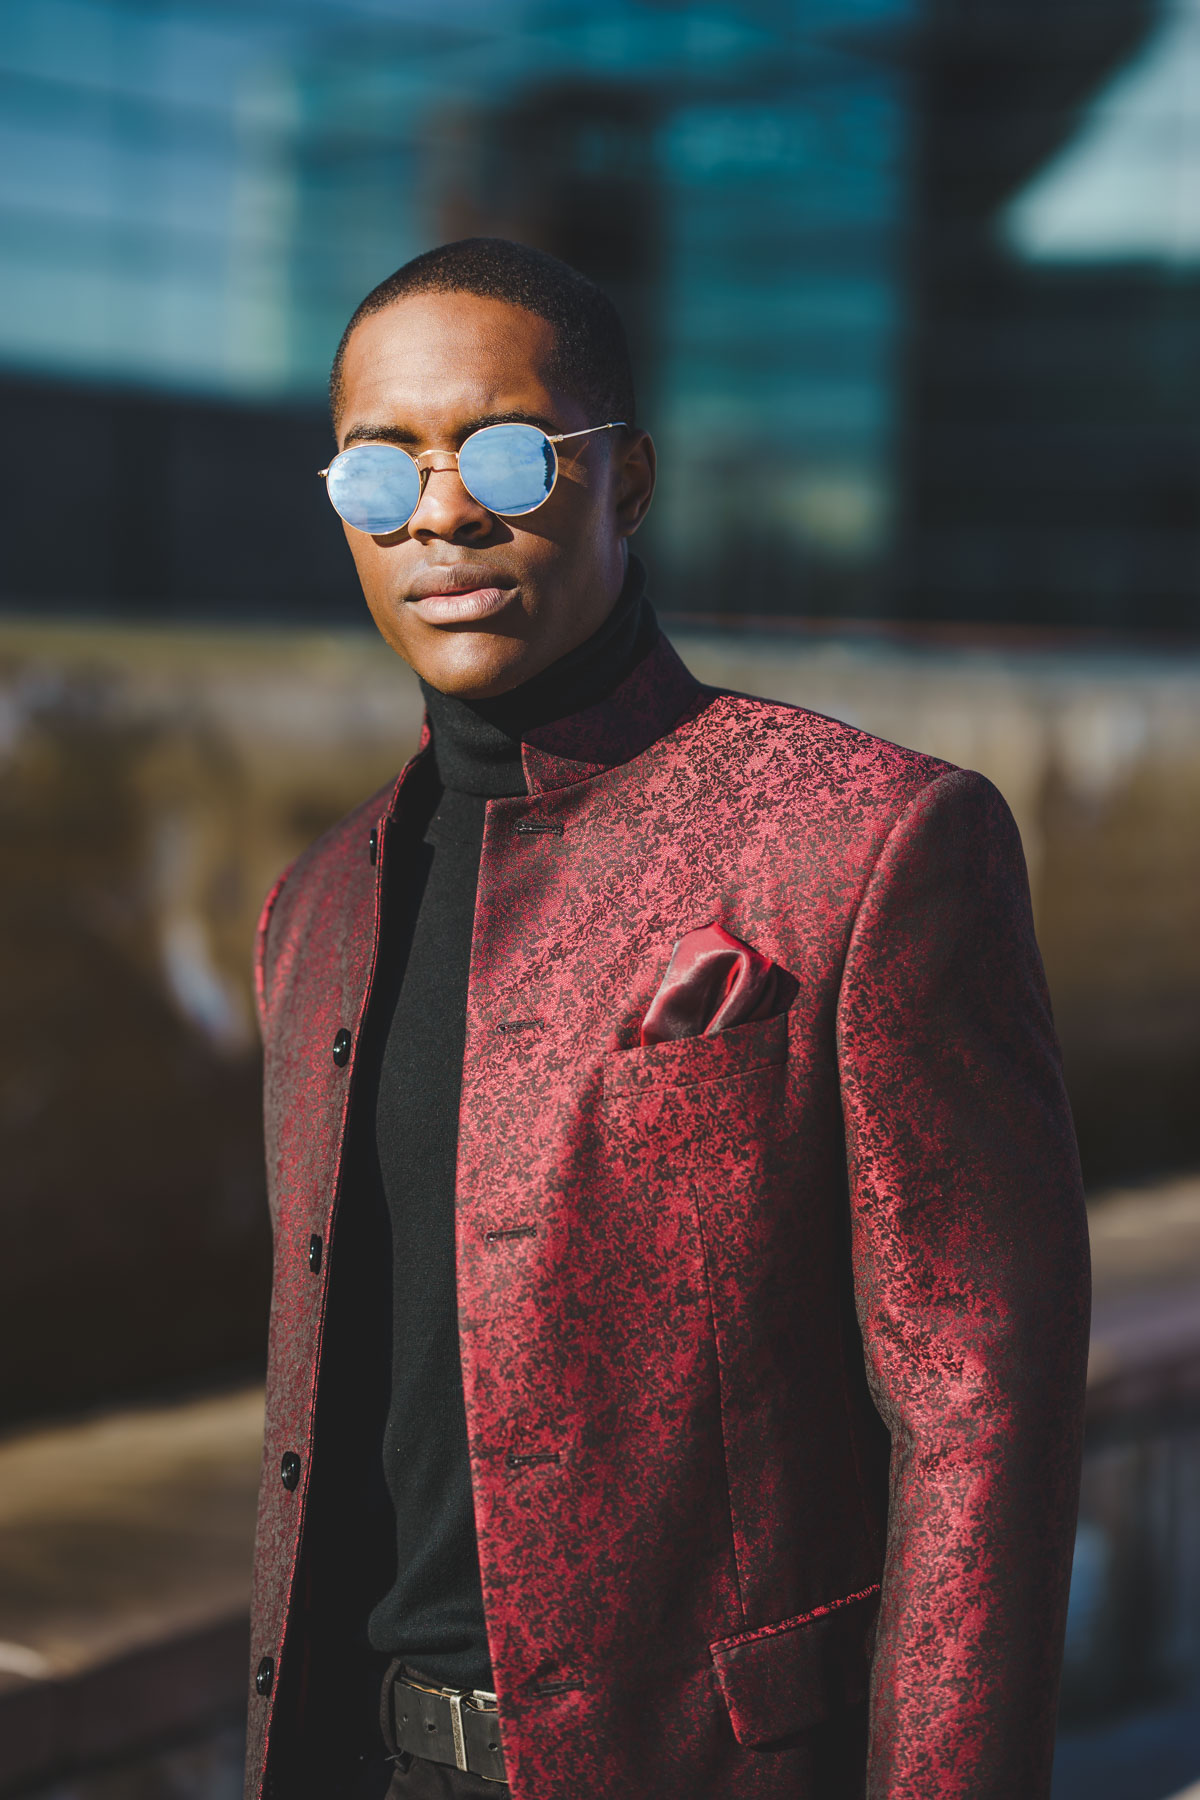 Mens Fashion PhotoShoot Tempe Arizona